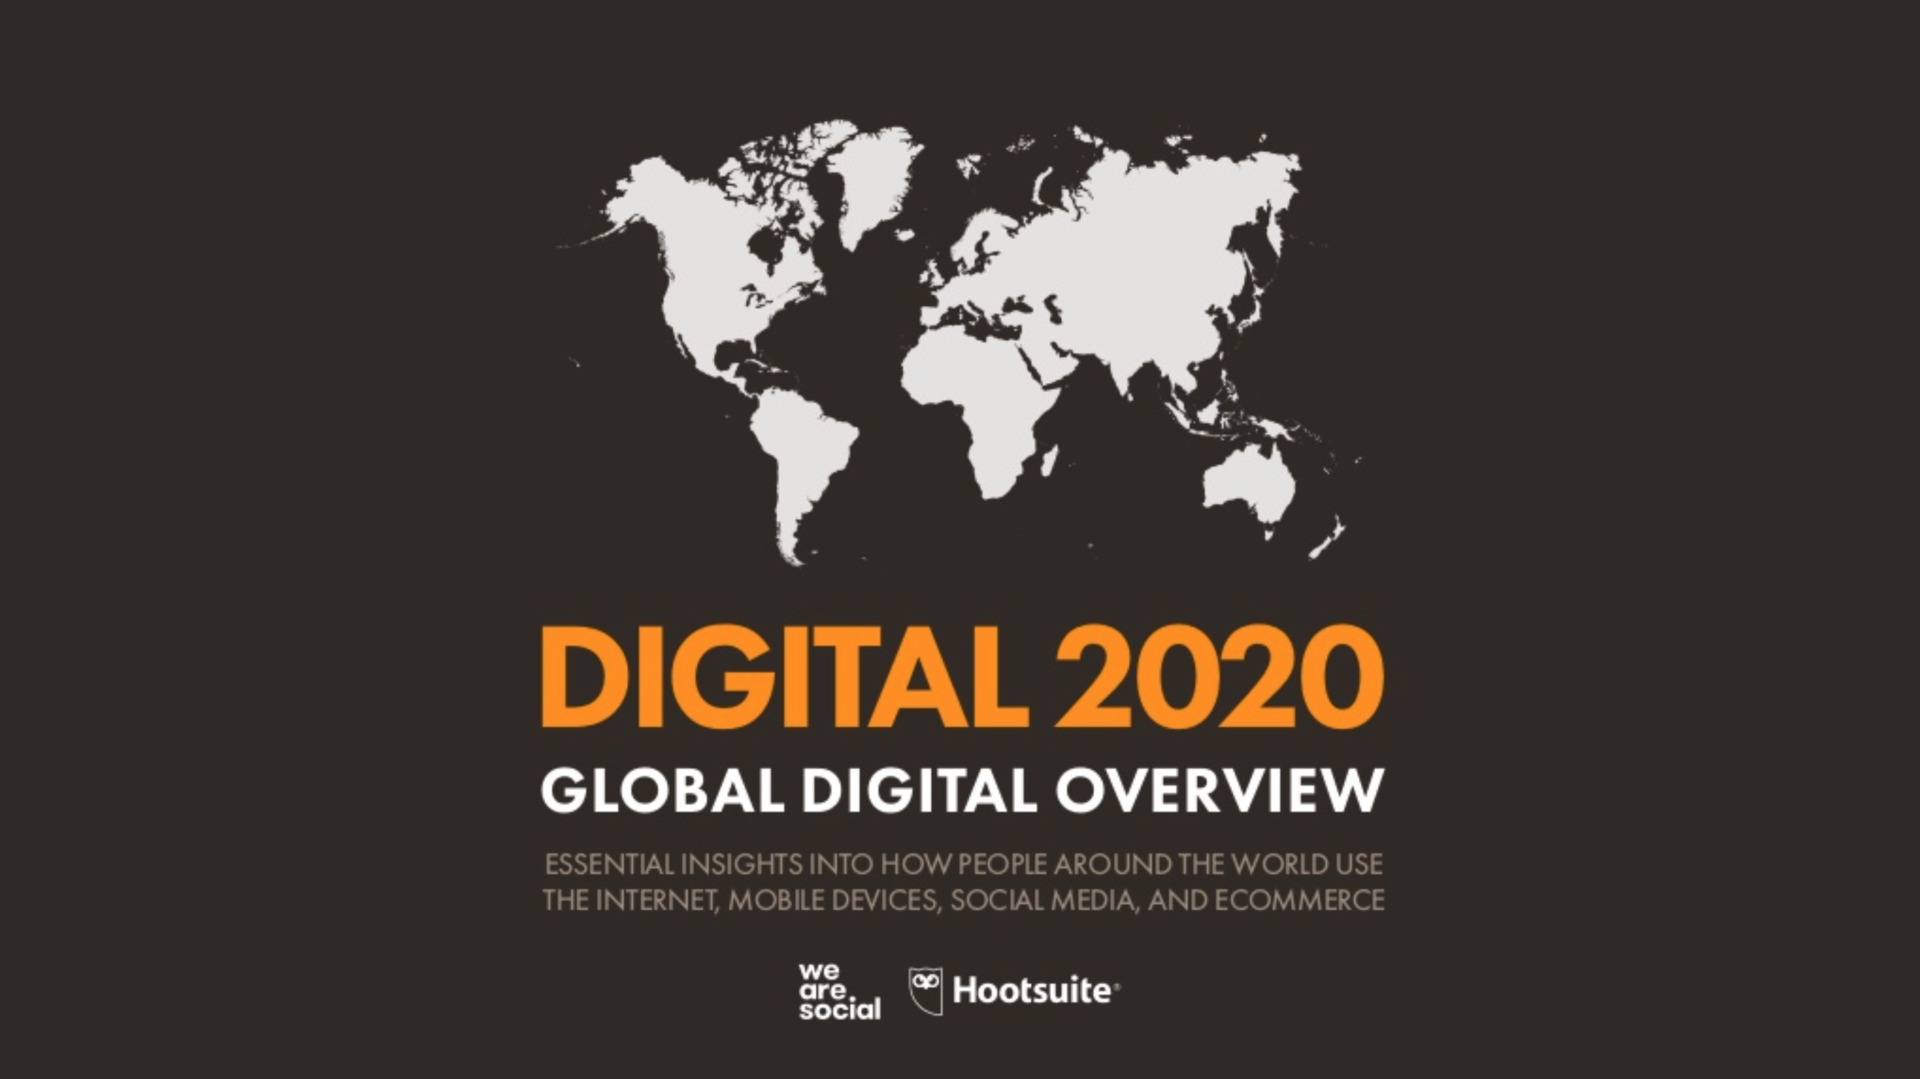 Global Digital Overviewのメインビジュアル